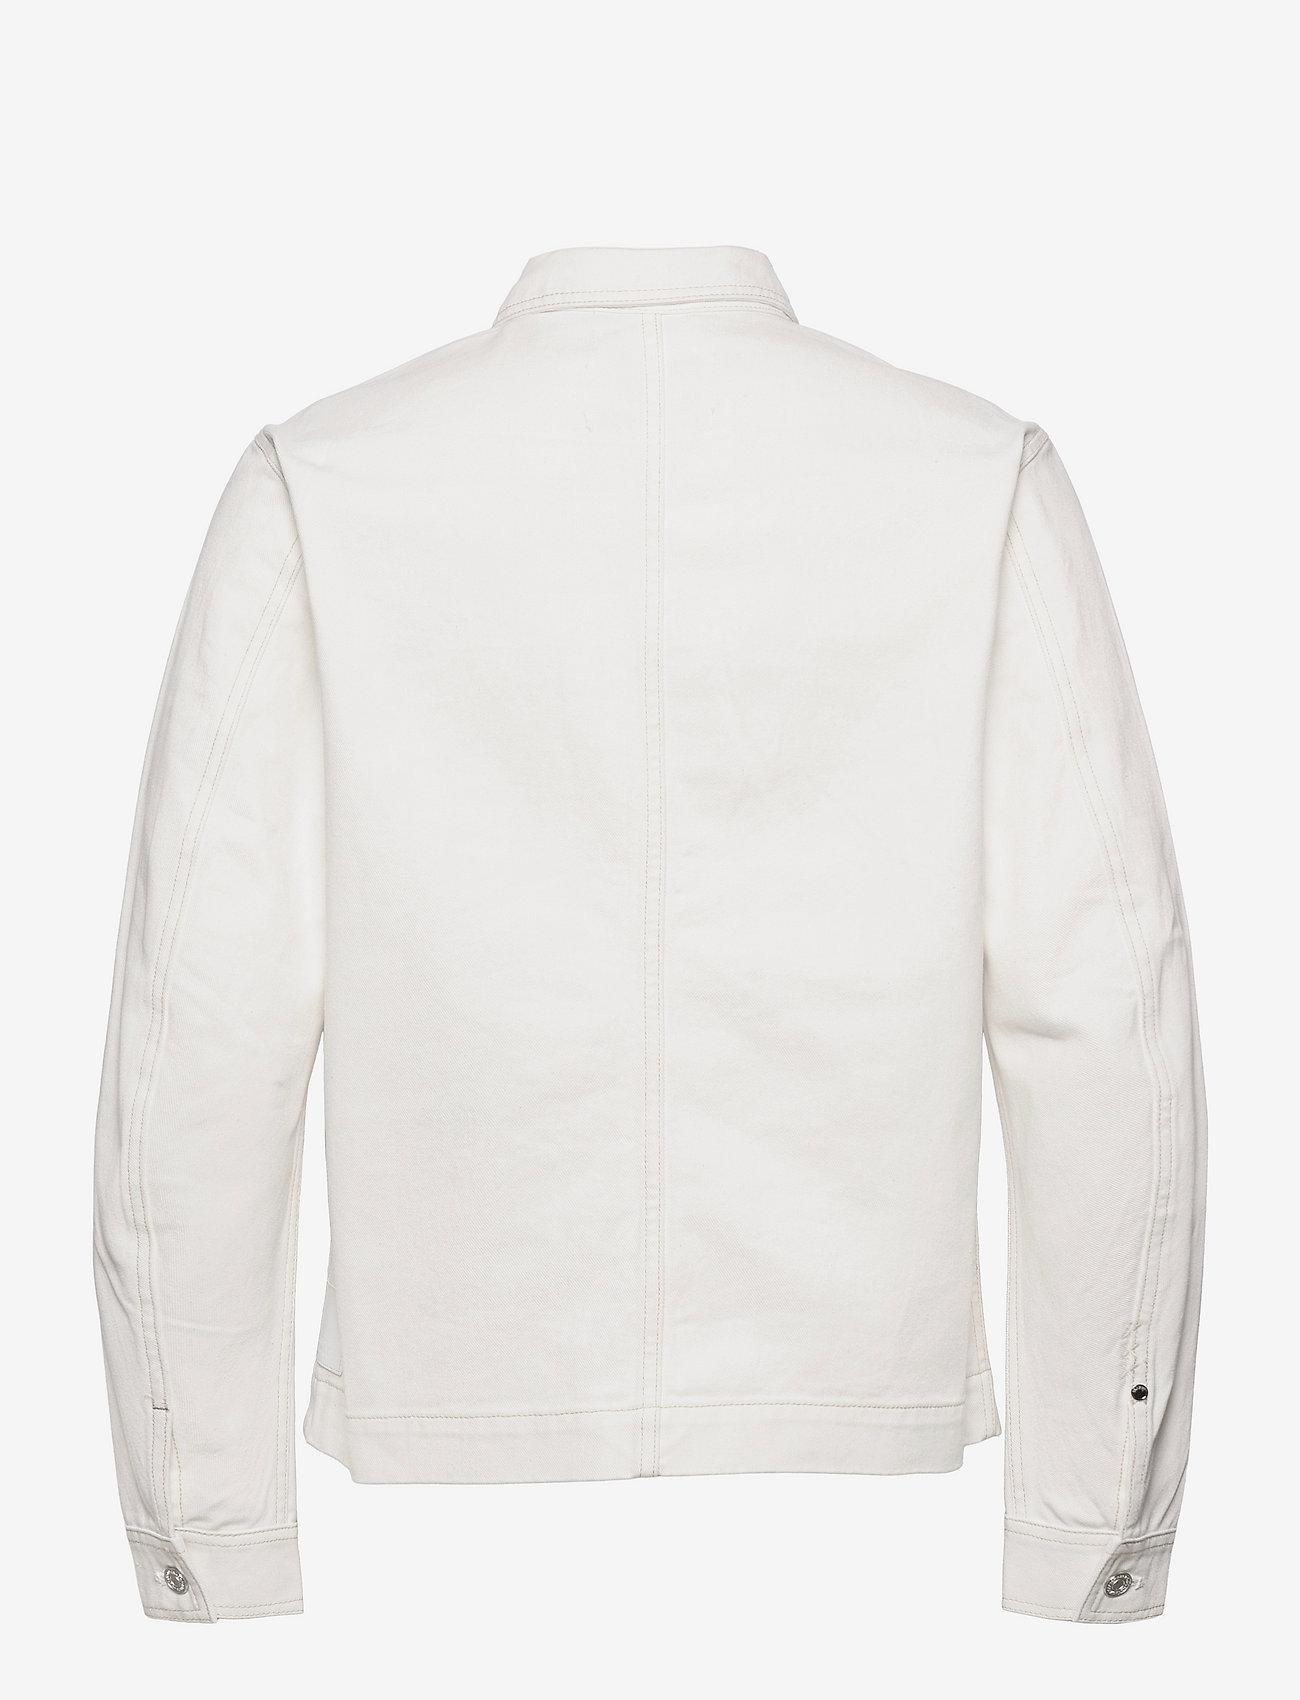 Scotch & Soda - Ams Blauw workwear shirt jacket - spijkerjassen - workwear white - 1